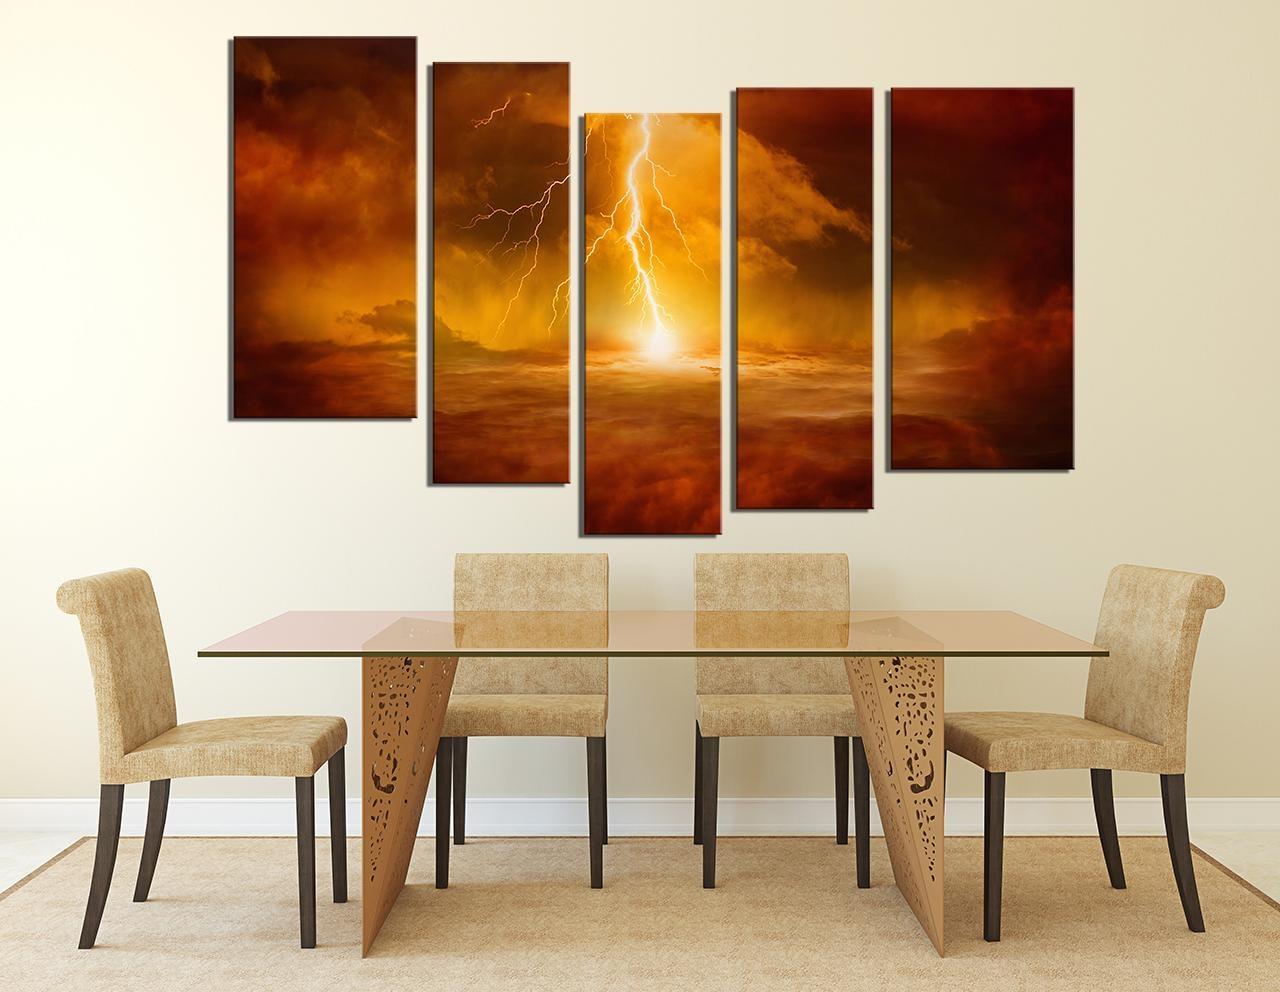 5 Piece Canvas Wall Art, Thunderstorm Huge Canvas Art, Abstract Within 7 Piece Canvas Wall Art (Image 2 of 22)